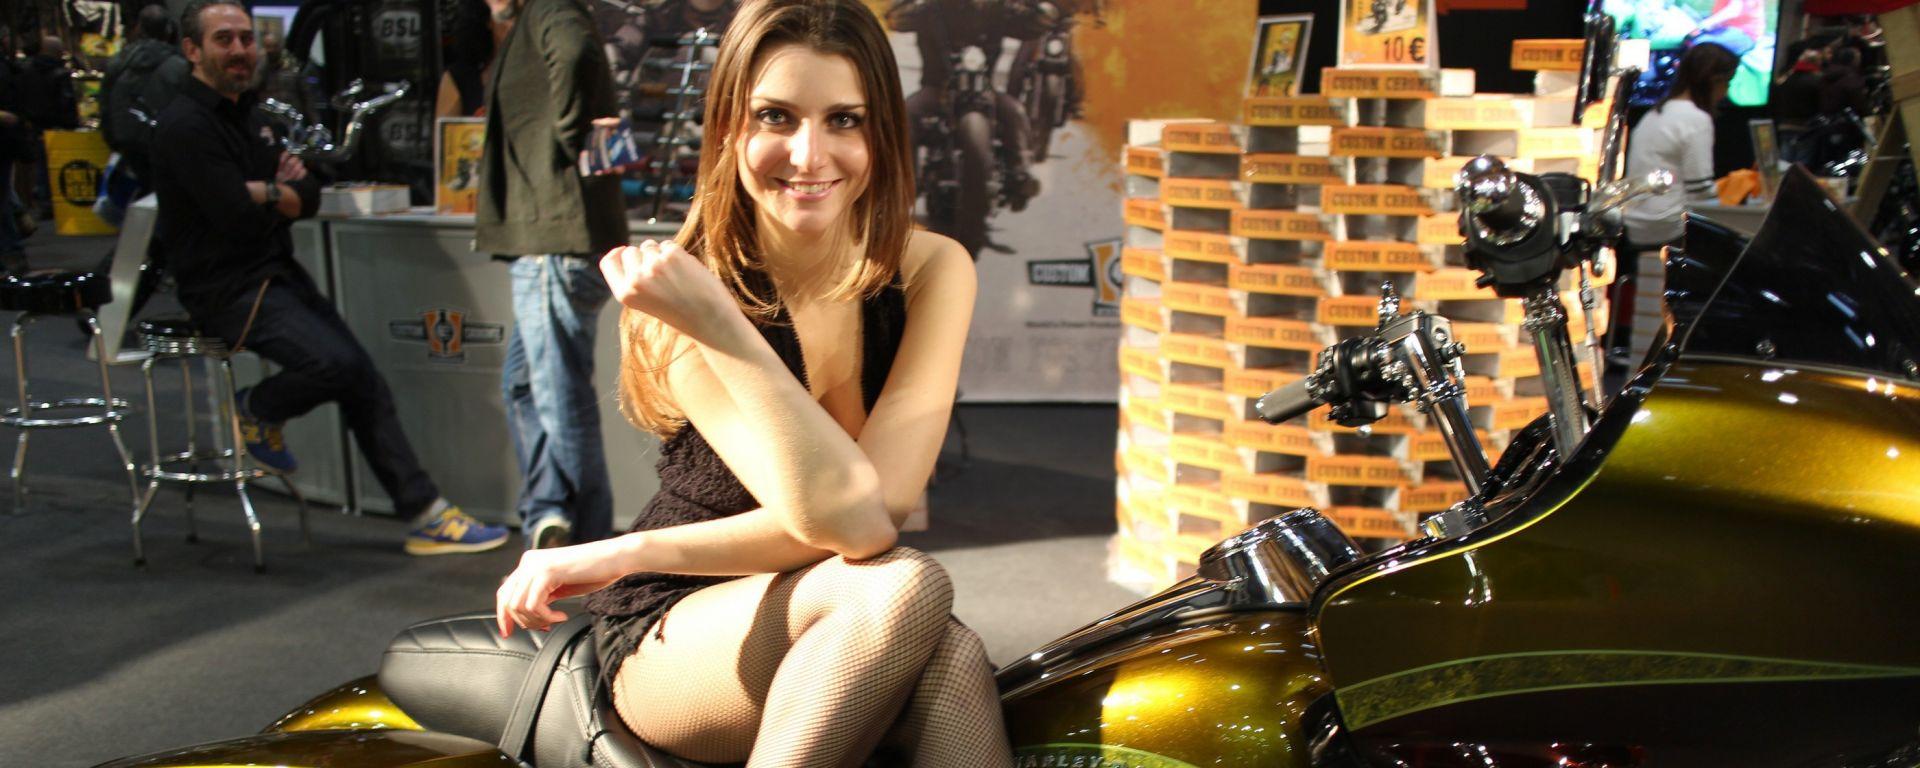 Motor Bike Expo 2016: info utili